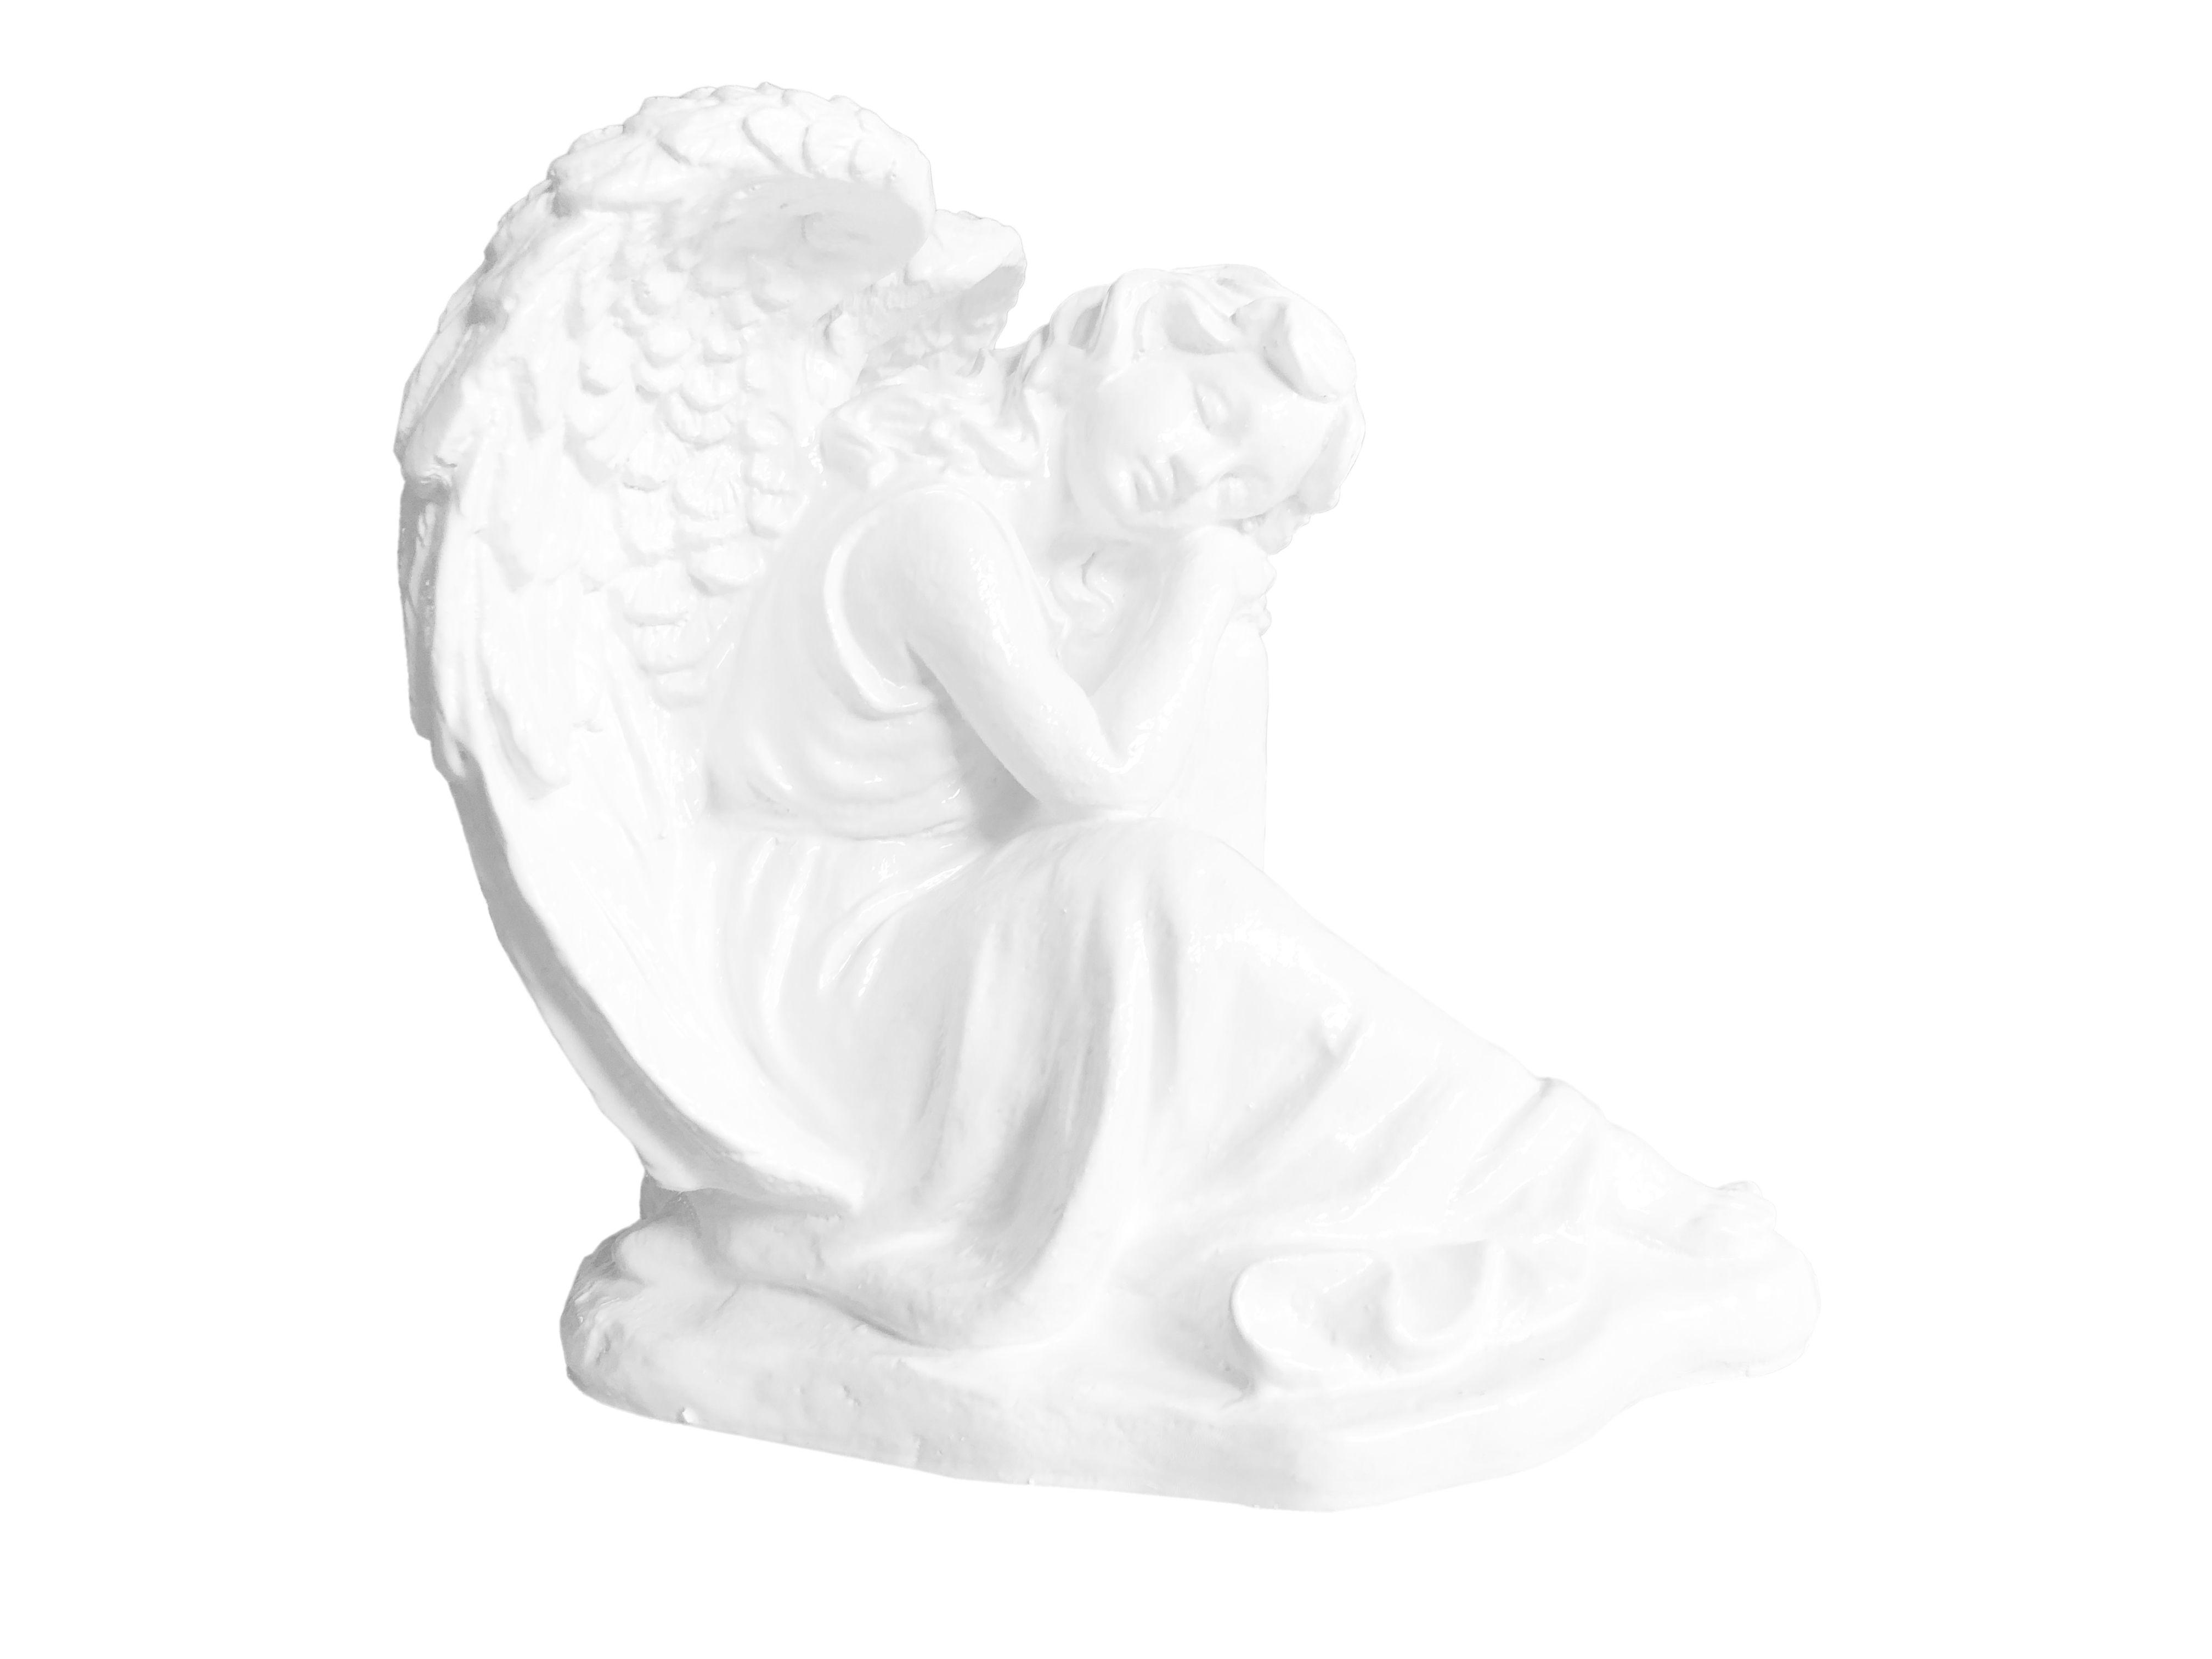 Aniol spiacy - figura nagrobna